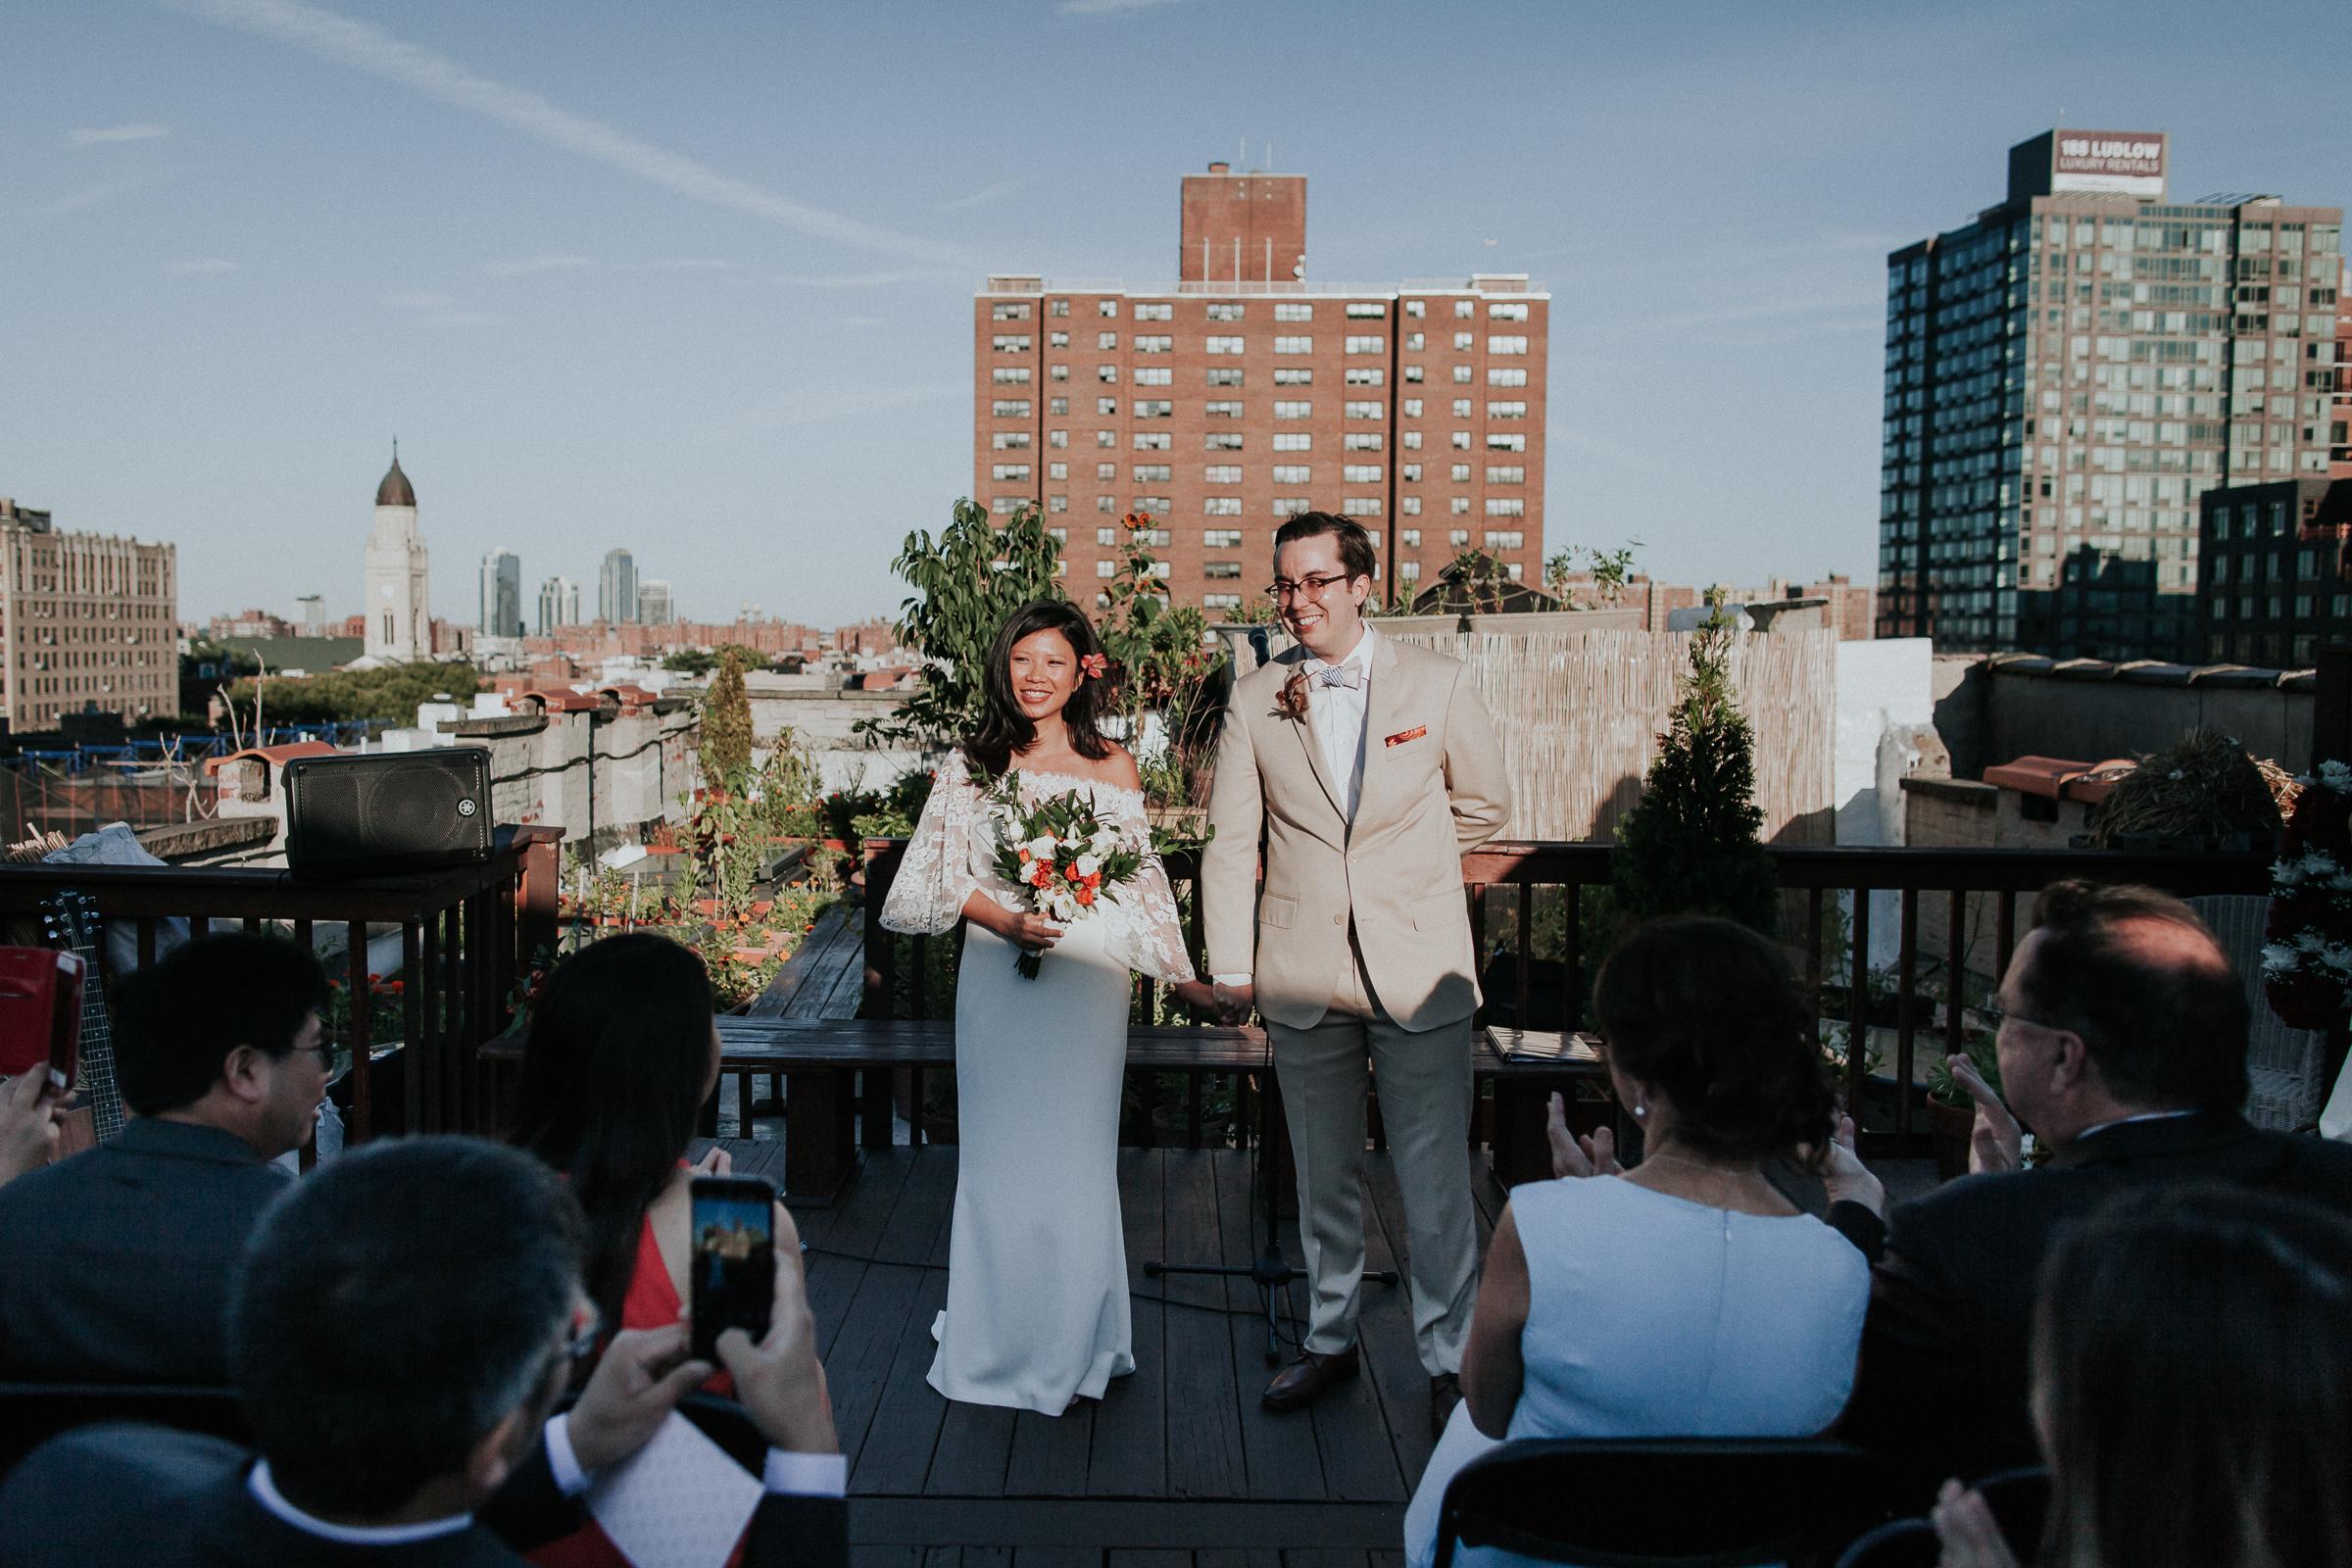 The-Bhakti-Center-Yoga-NYC-Rooftop-Documentary-Wedding-Photographer-39.jpg